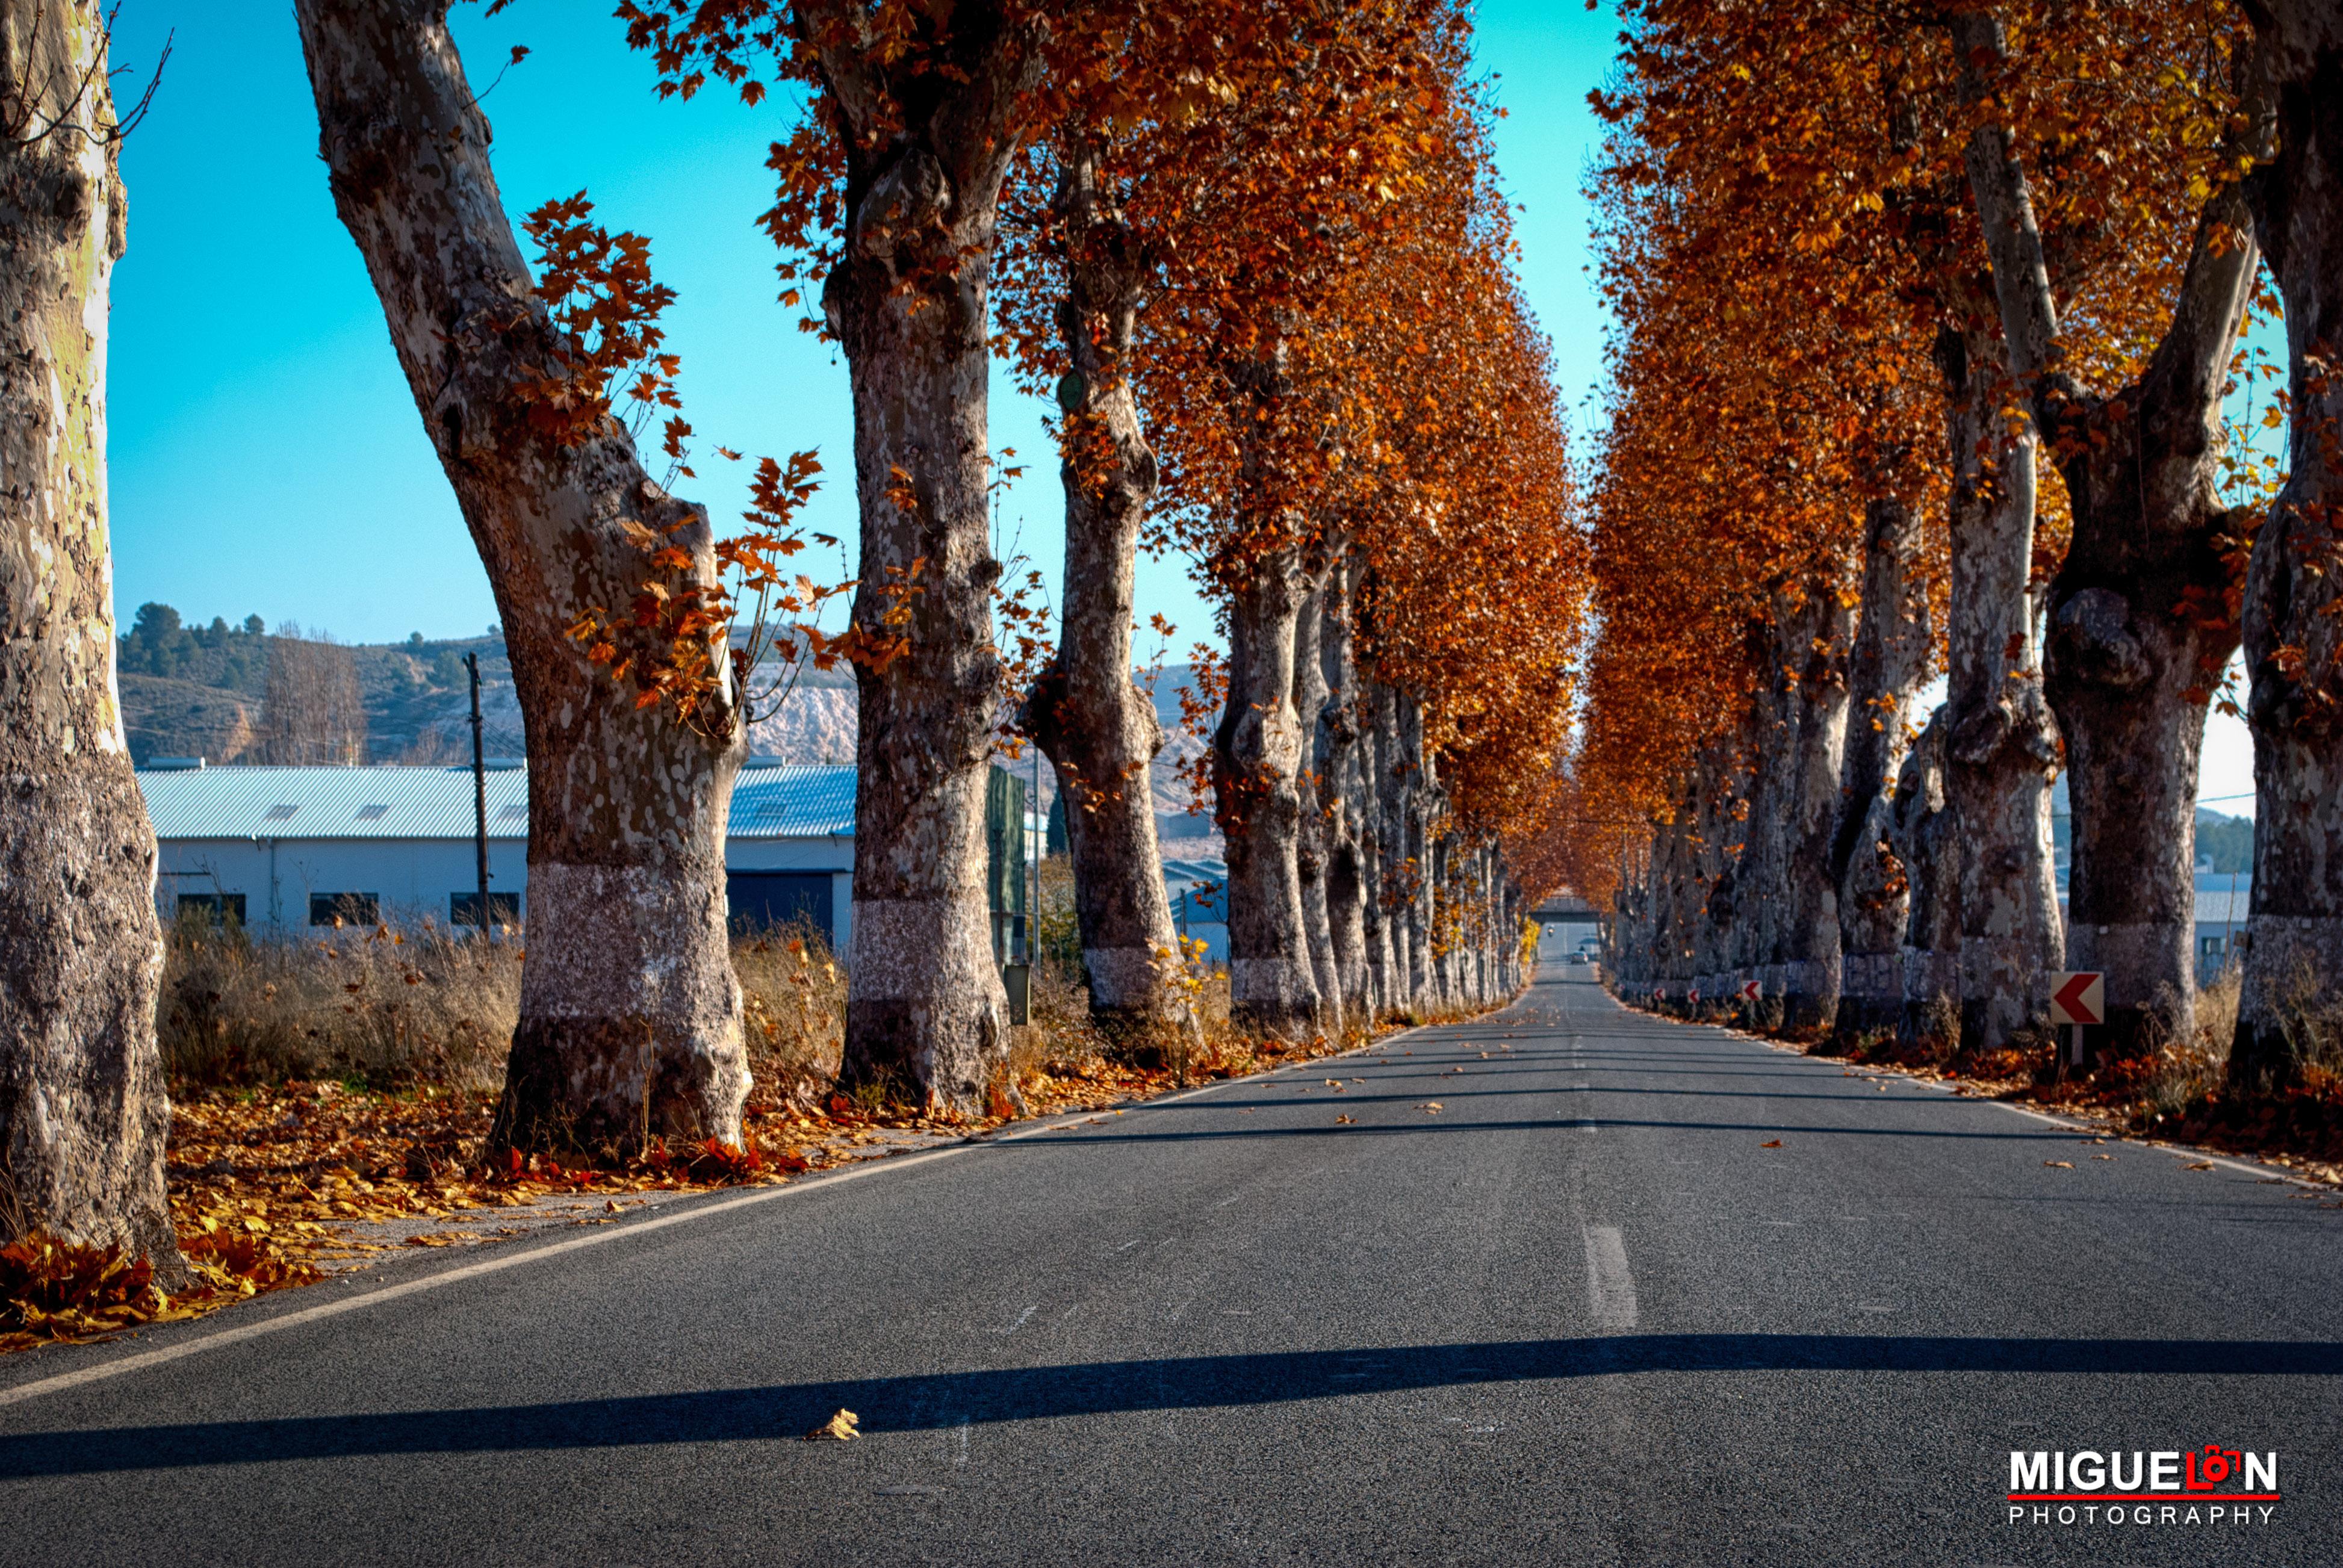 Fondos de pantalla : Árboles, paisaje, contraste, vistoso, otoño ...